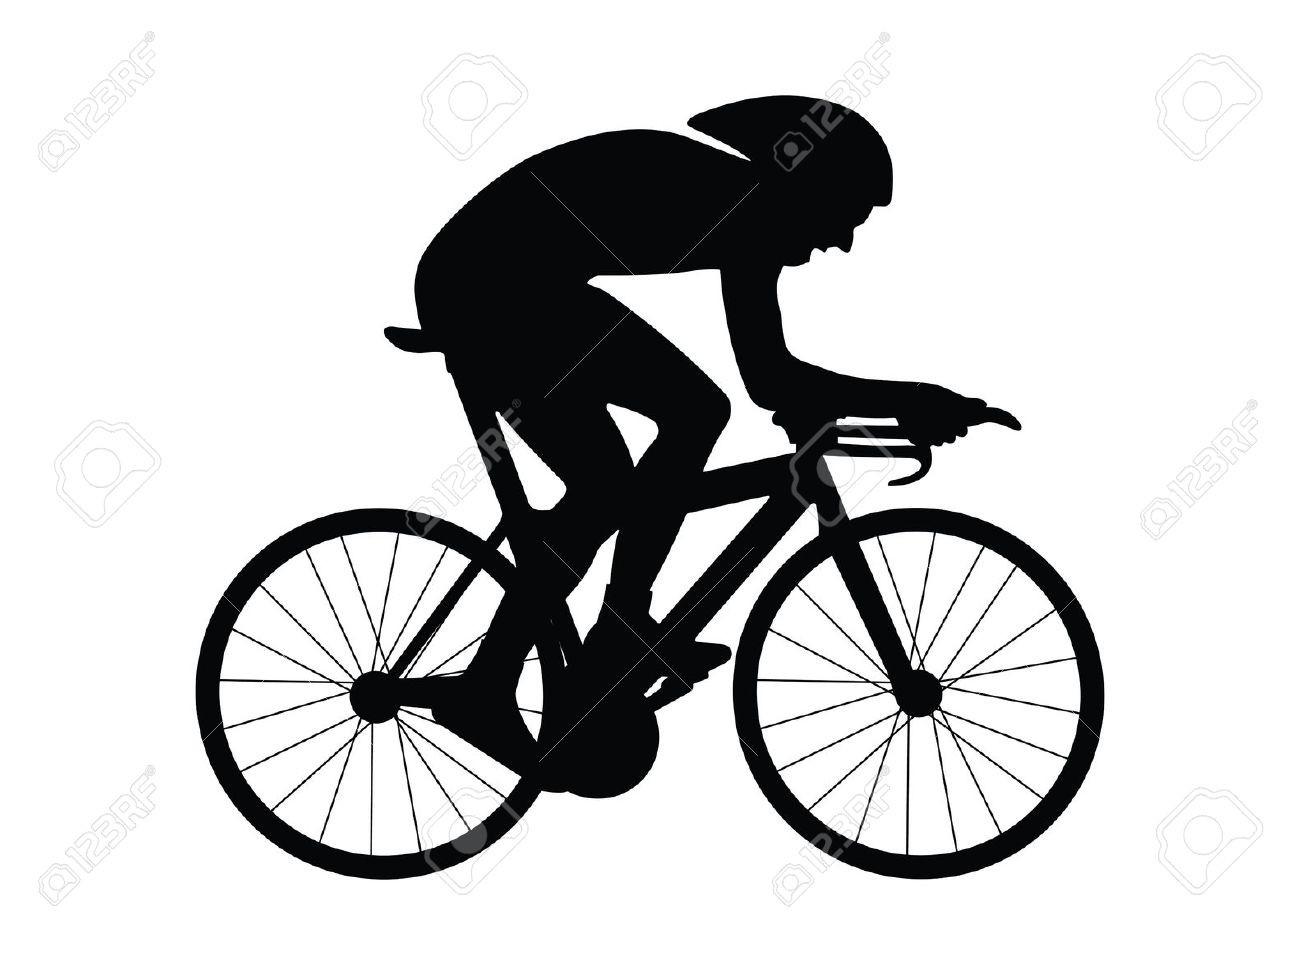 1300x975 Road Bike Silhouette Riding Bike